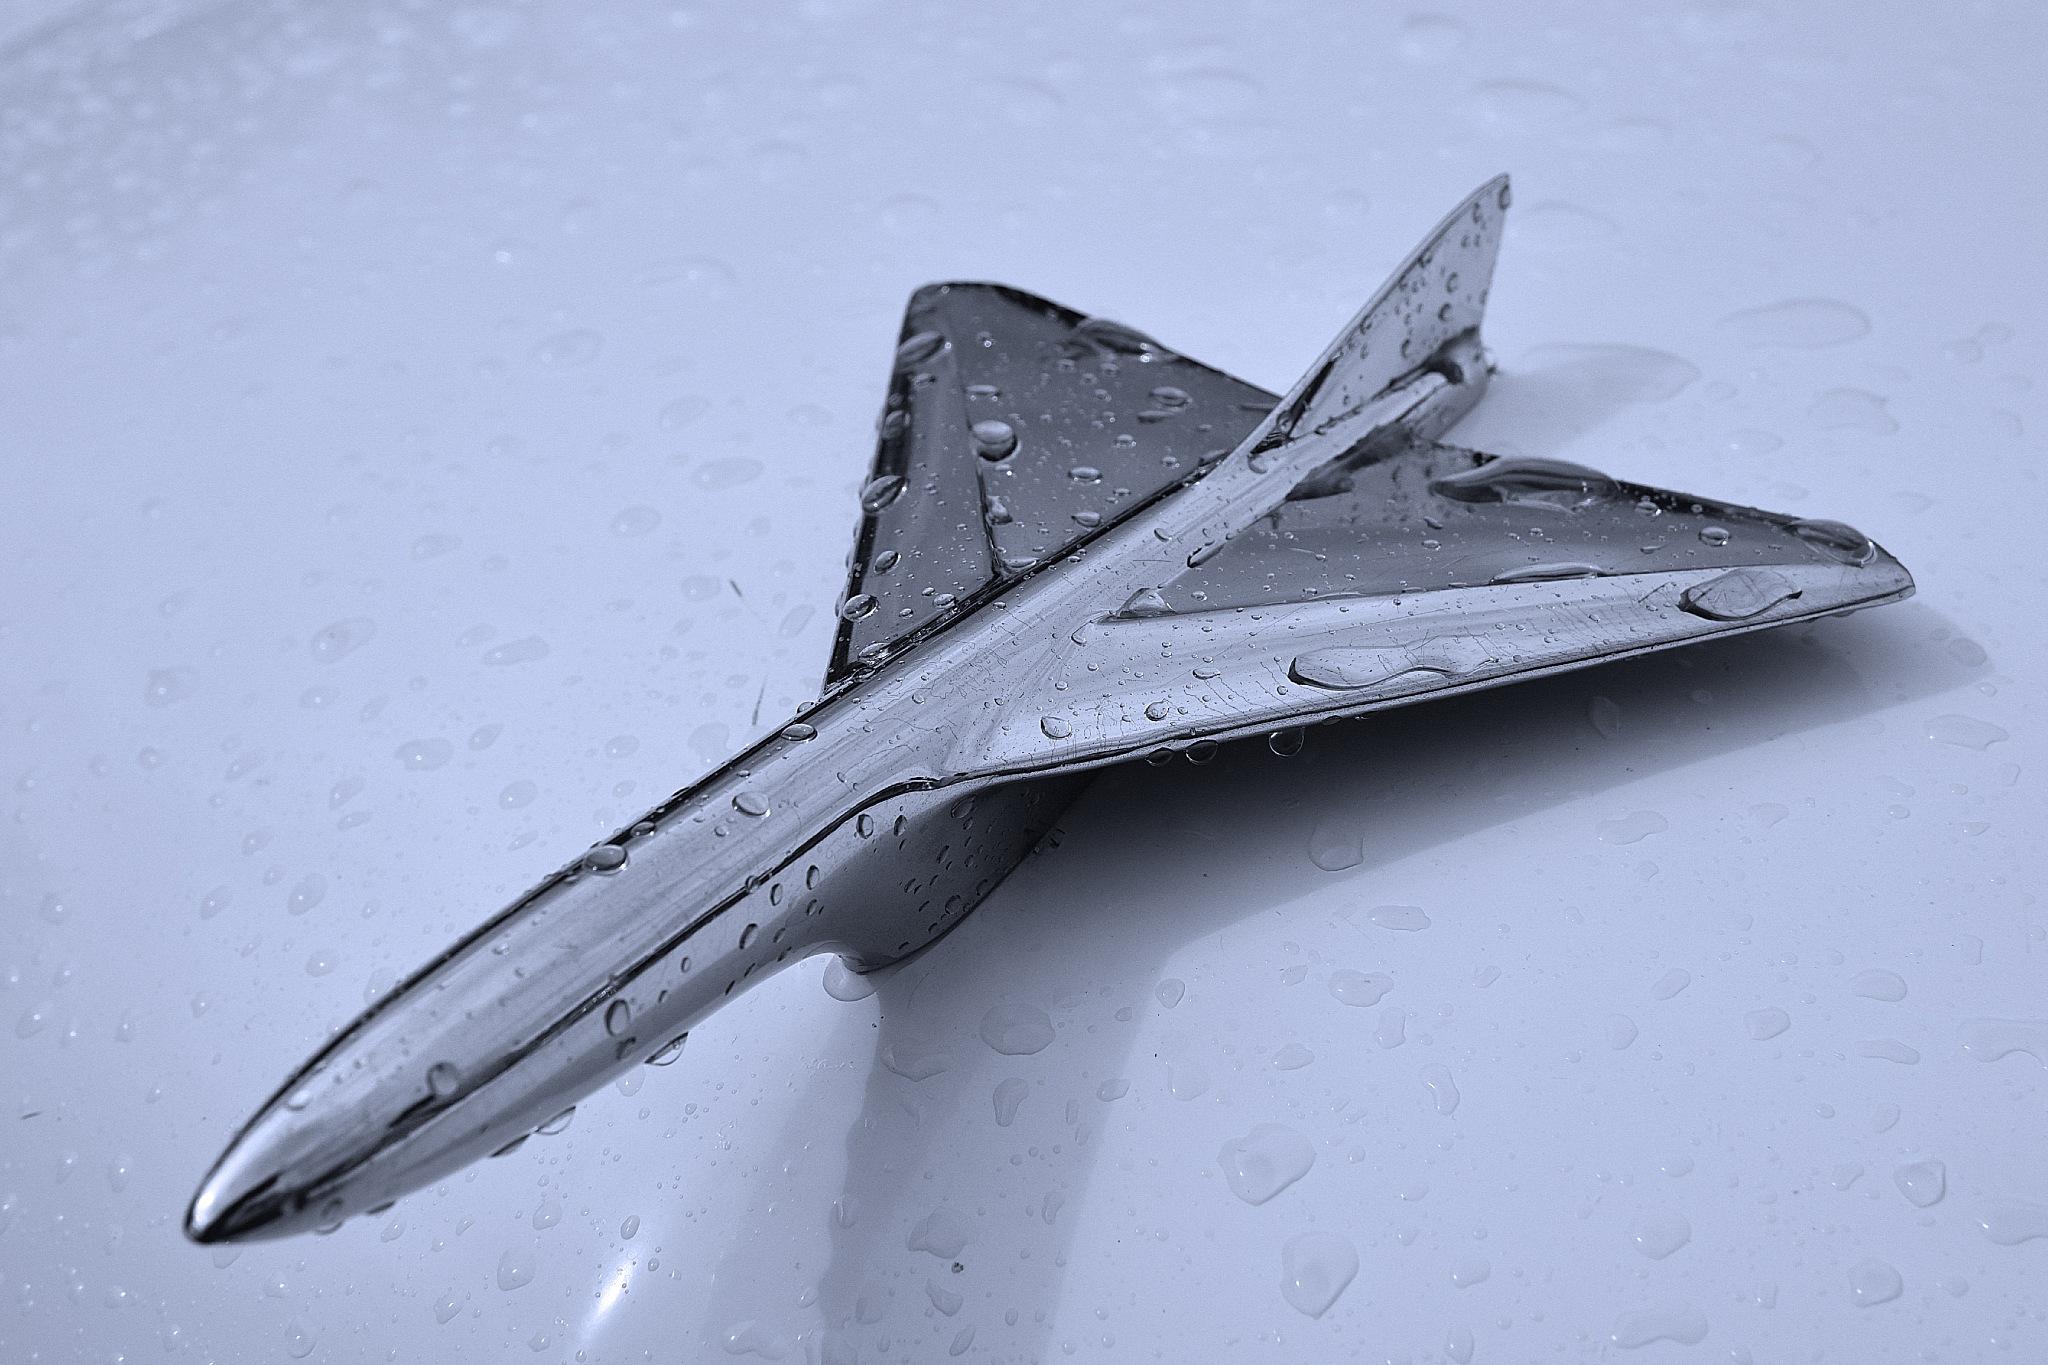 Rainy hood ornament by Lars Flodmark